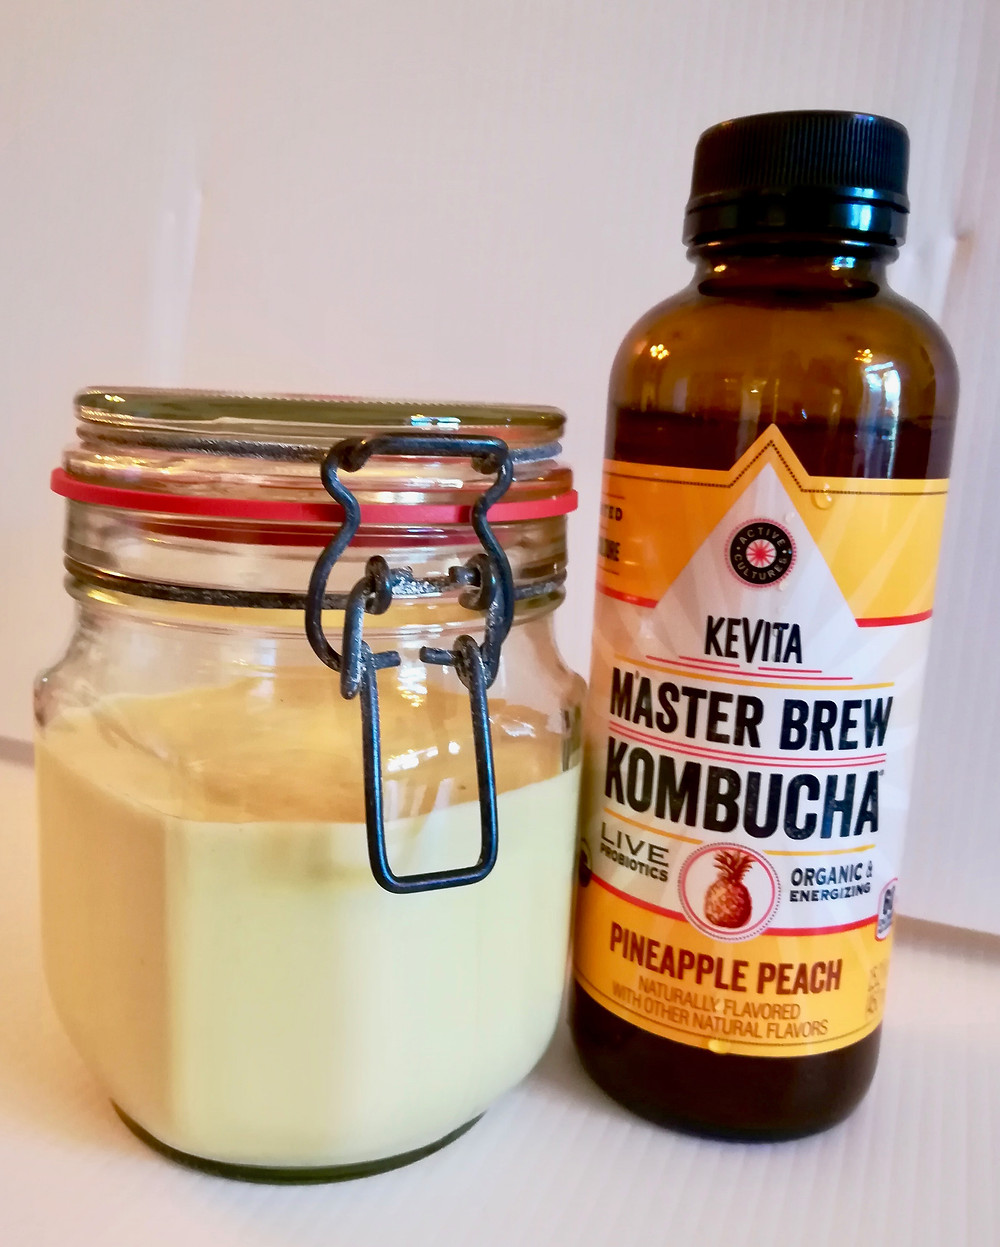 Jar of homemade kombucha mayonnaise with a bottle of kombucha